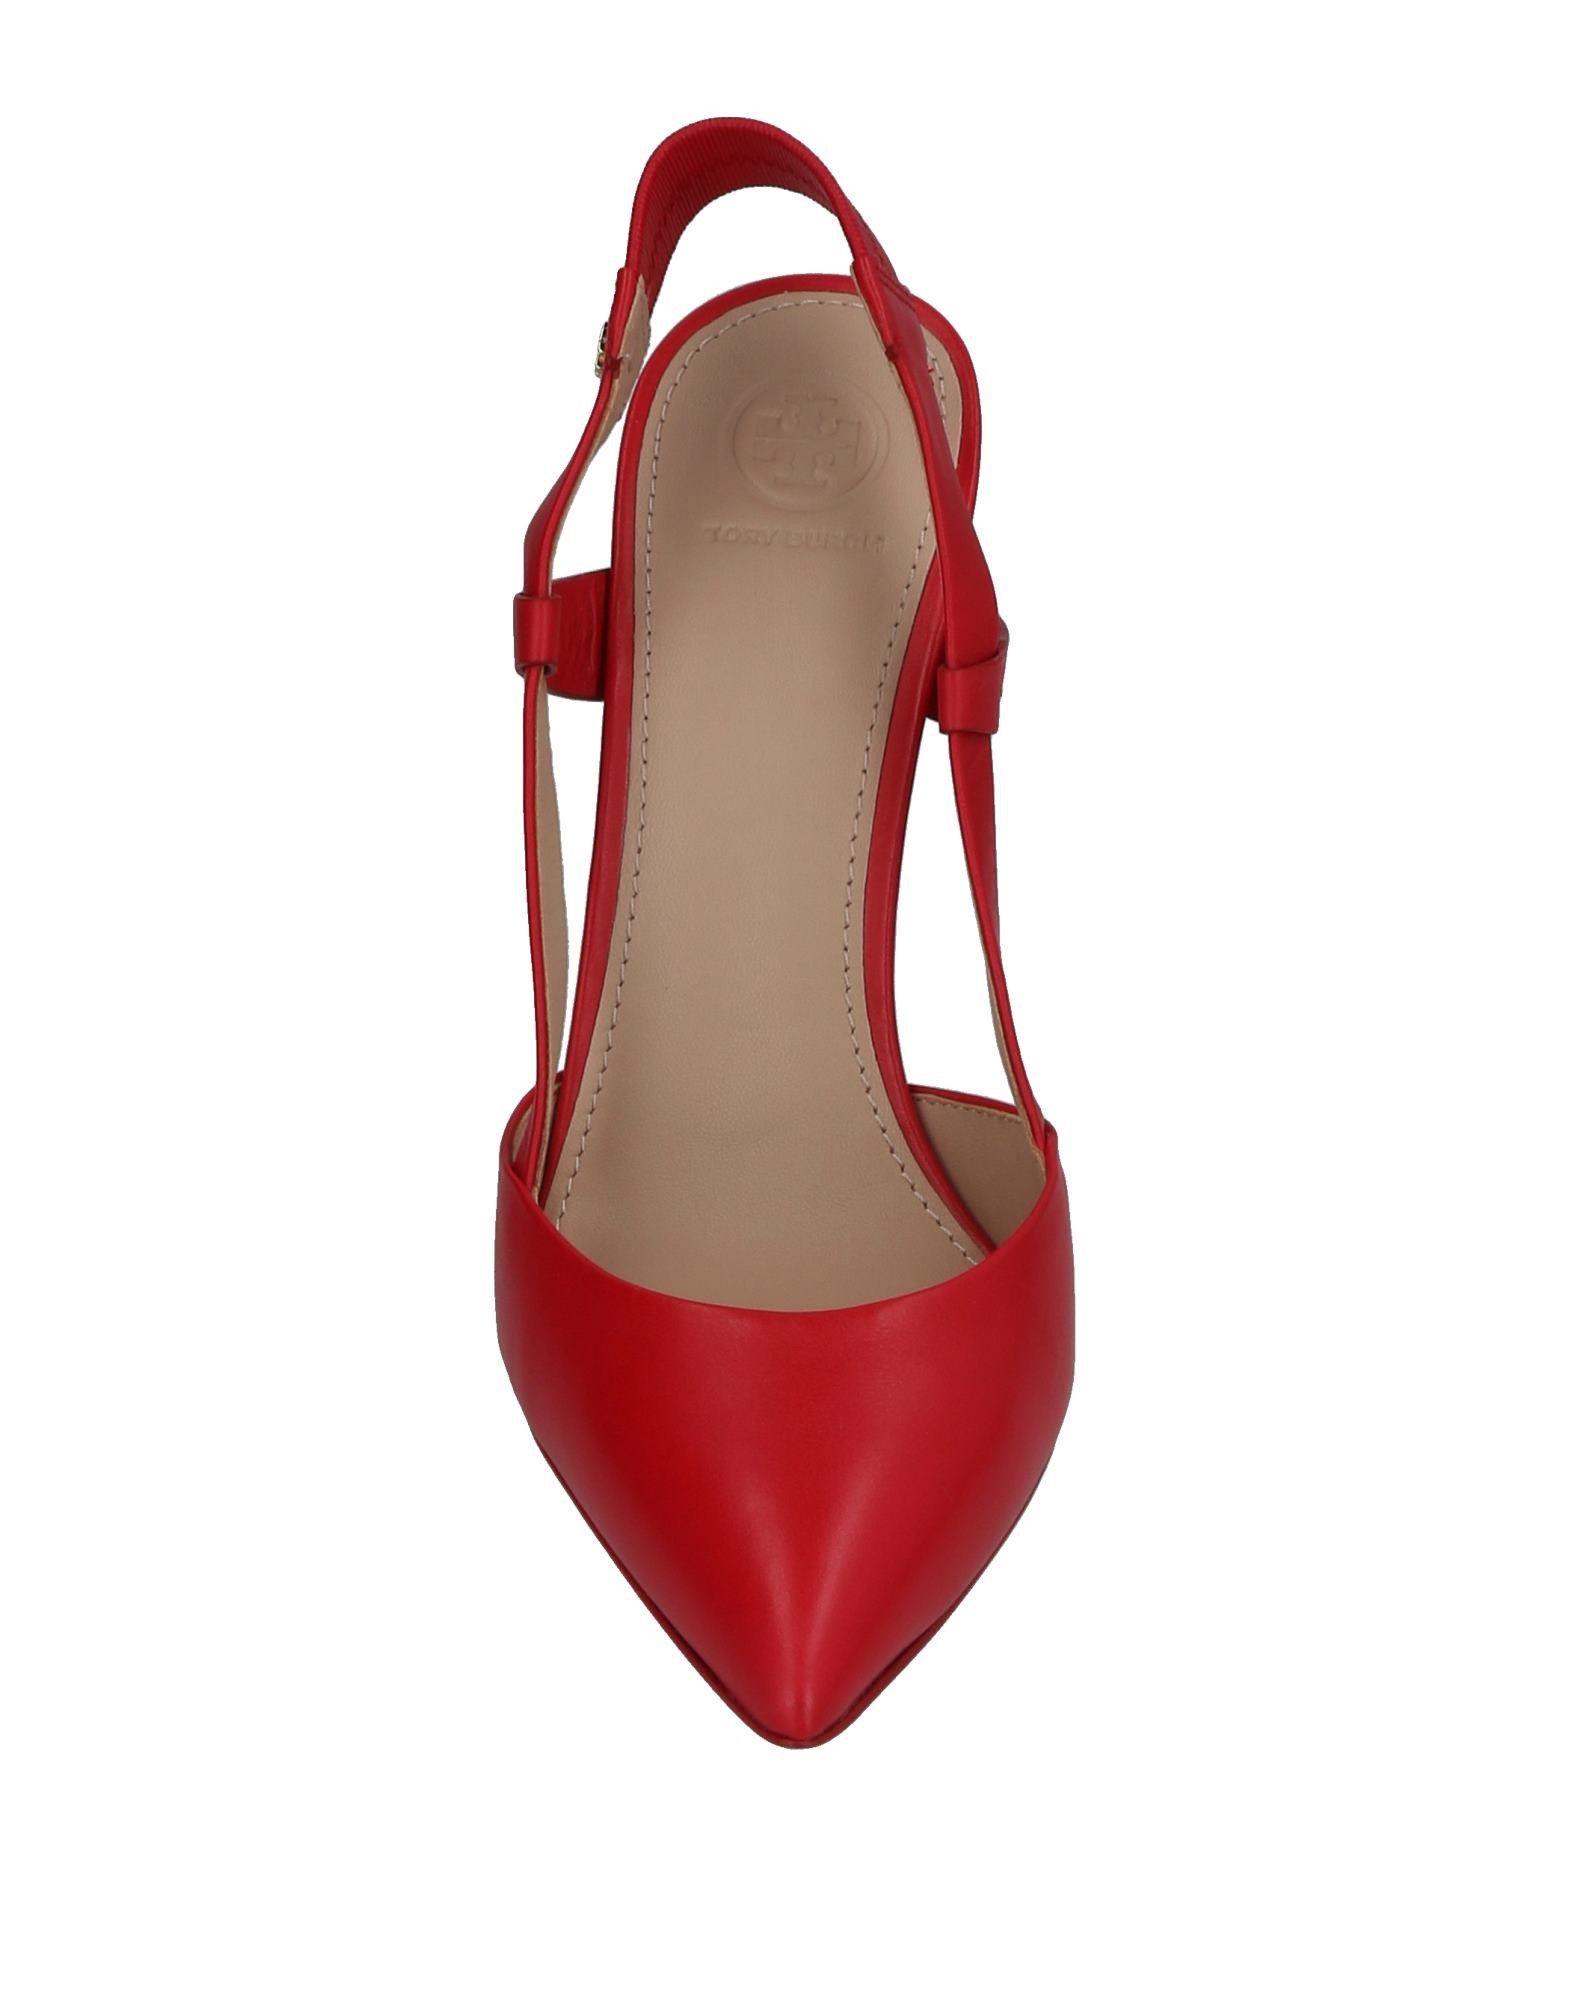 Stilvolle Pumps billige Schuhe Tory Burch Pumps Stilvolle Damen  11429563UV 92ecab